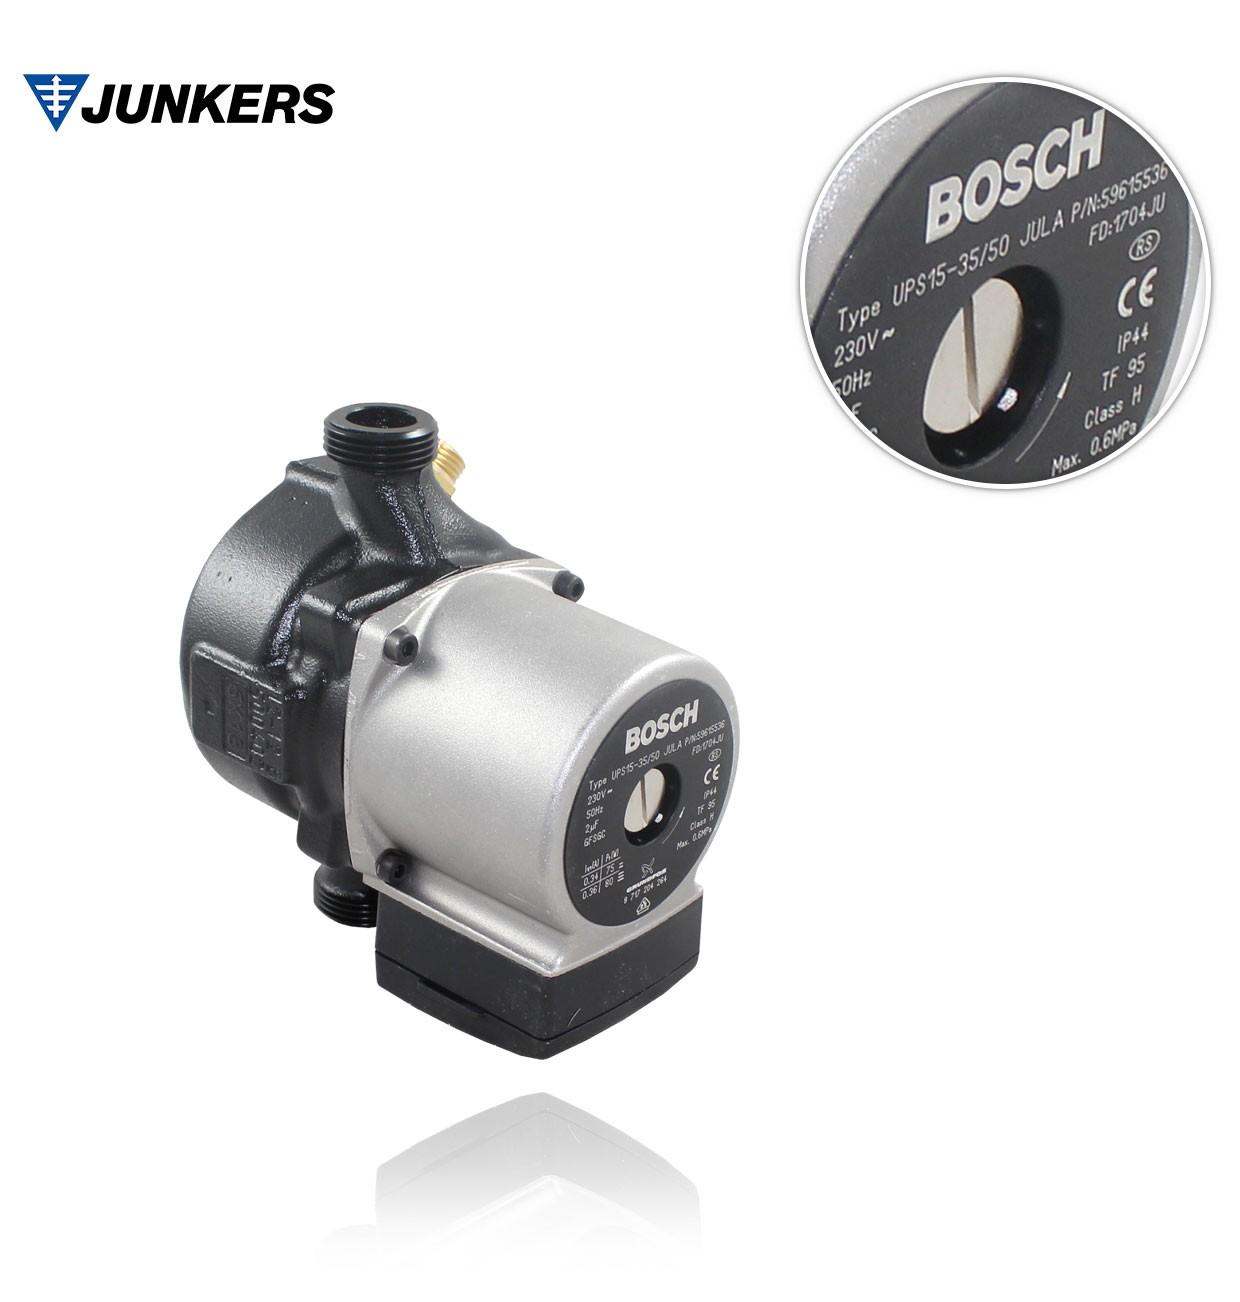 Bosch szivattyú 87172042640